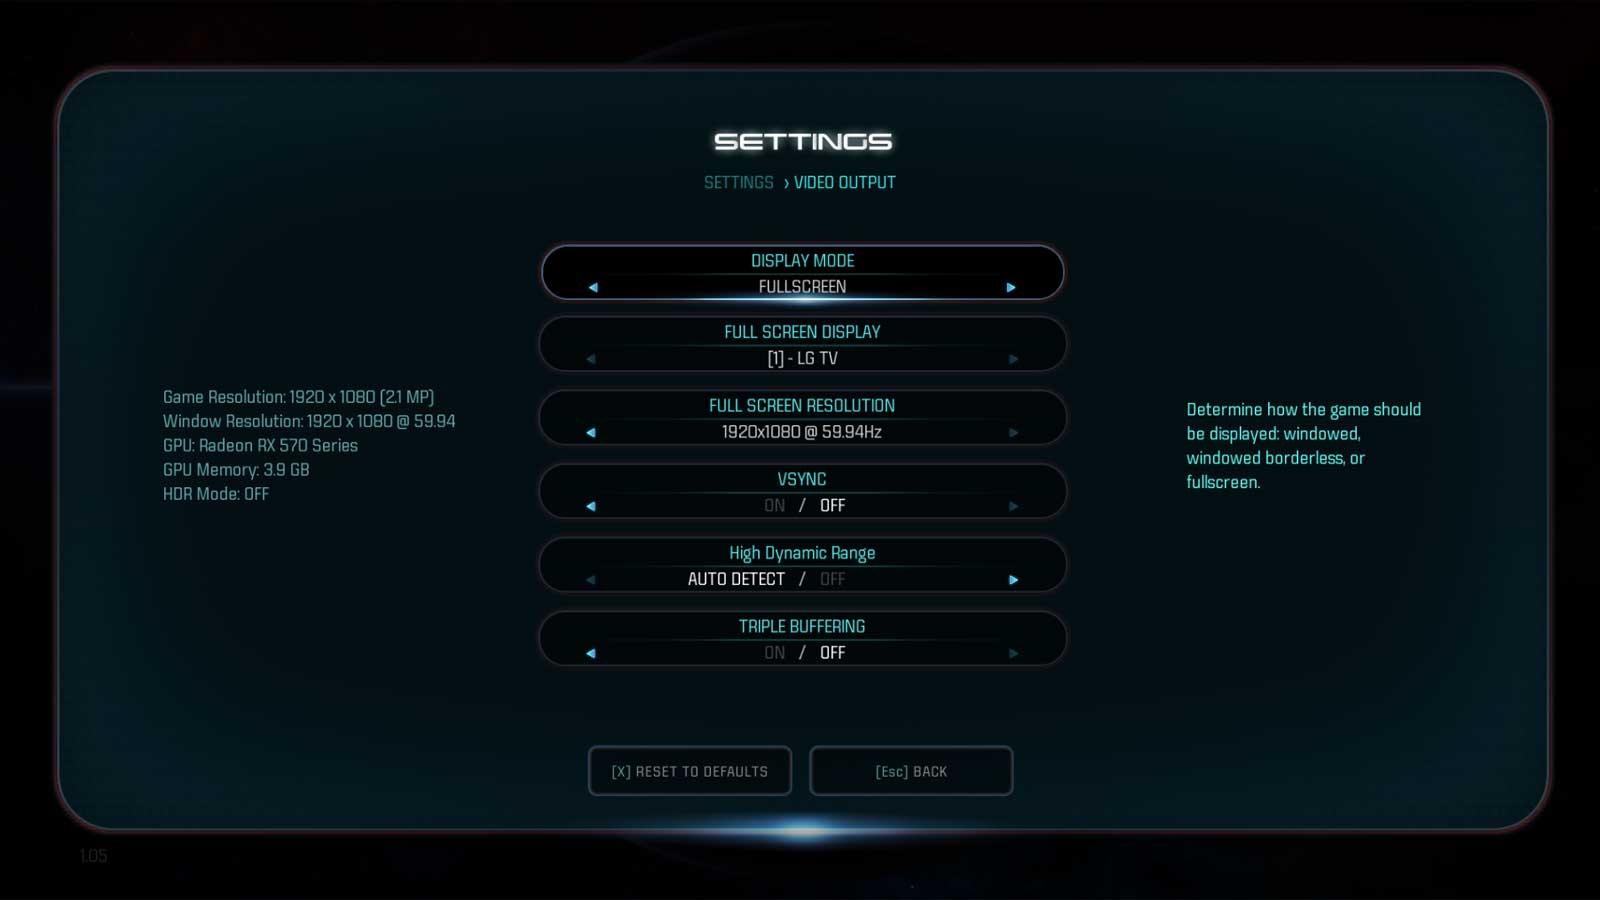 Mass Effect: Andromeda nastavení testu 1